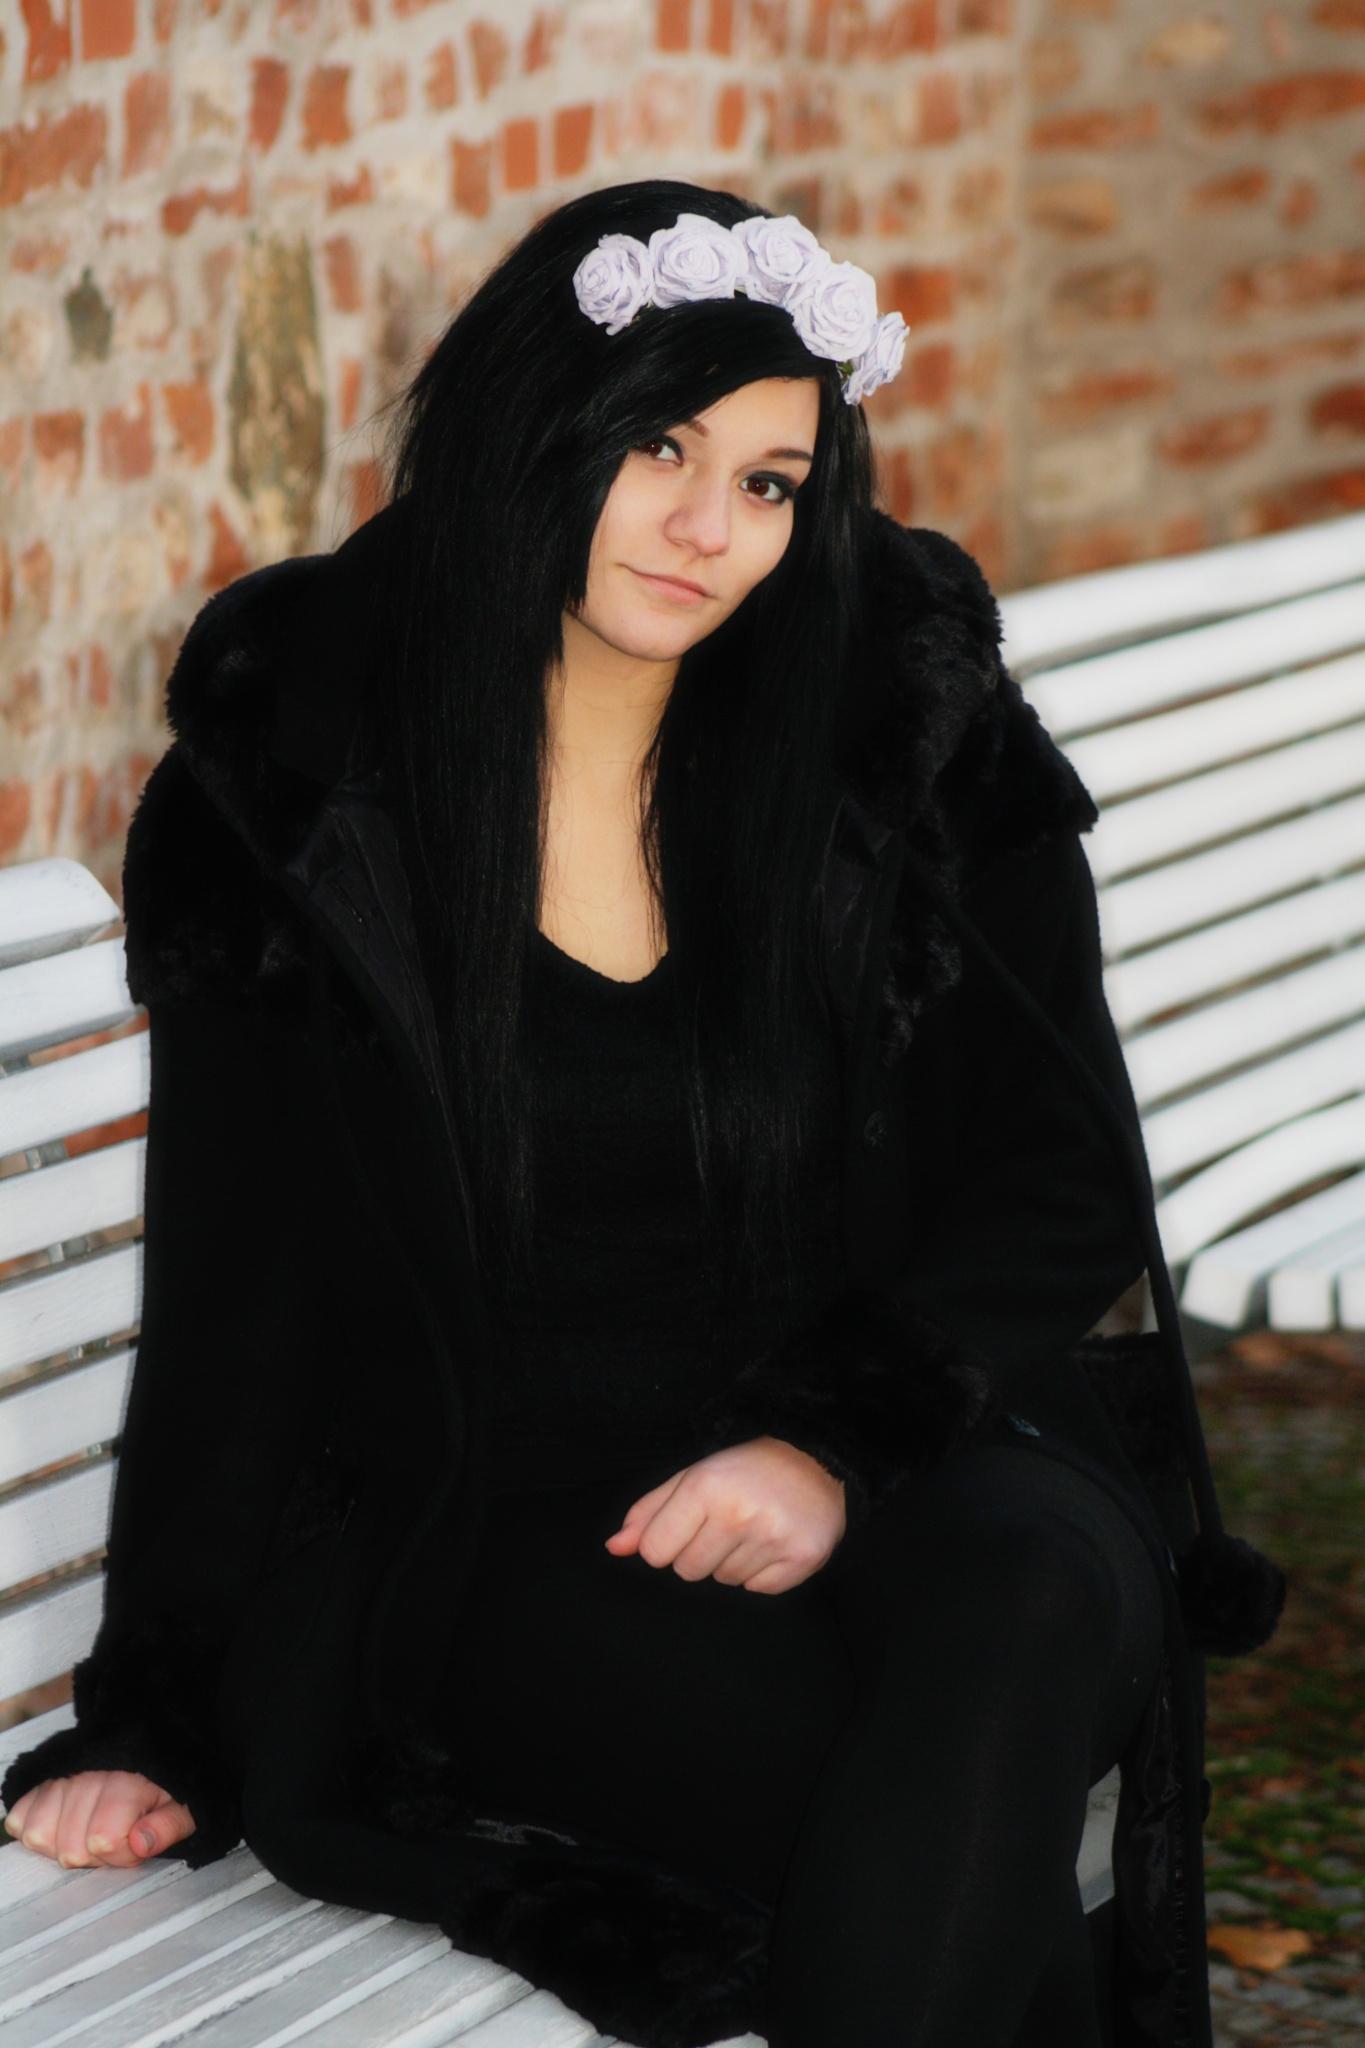 Raven girl by TenjiCZ